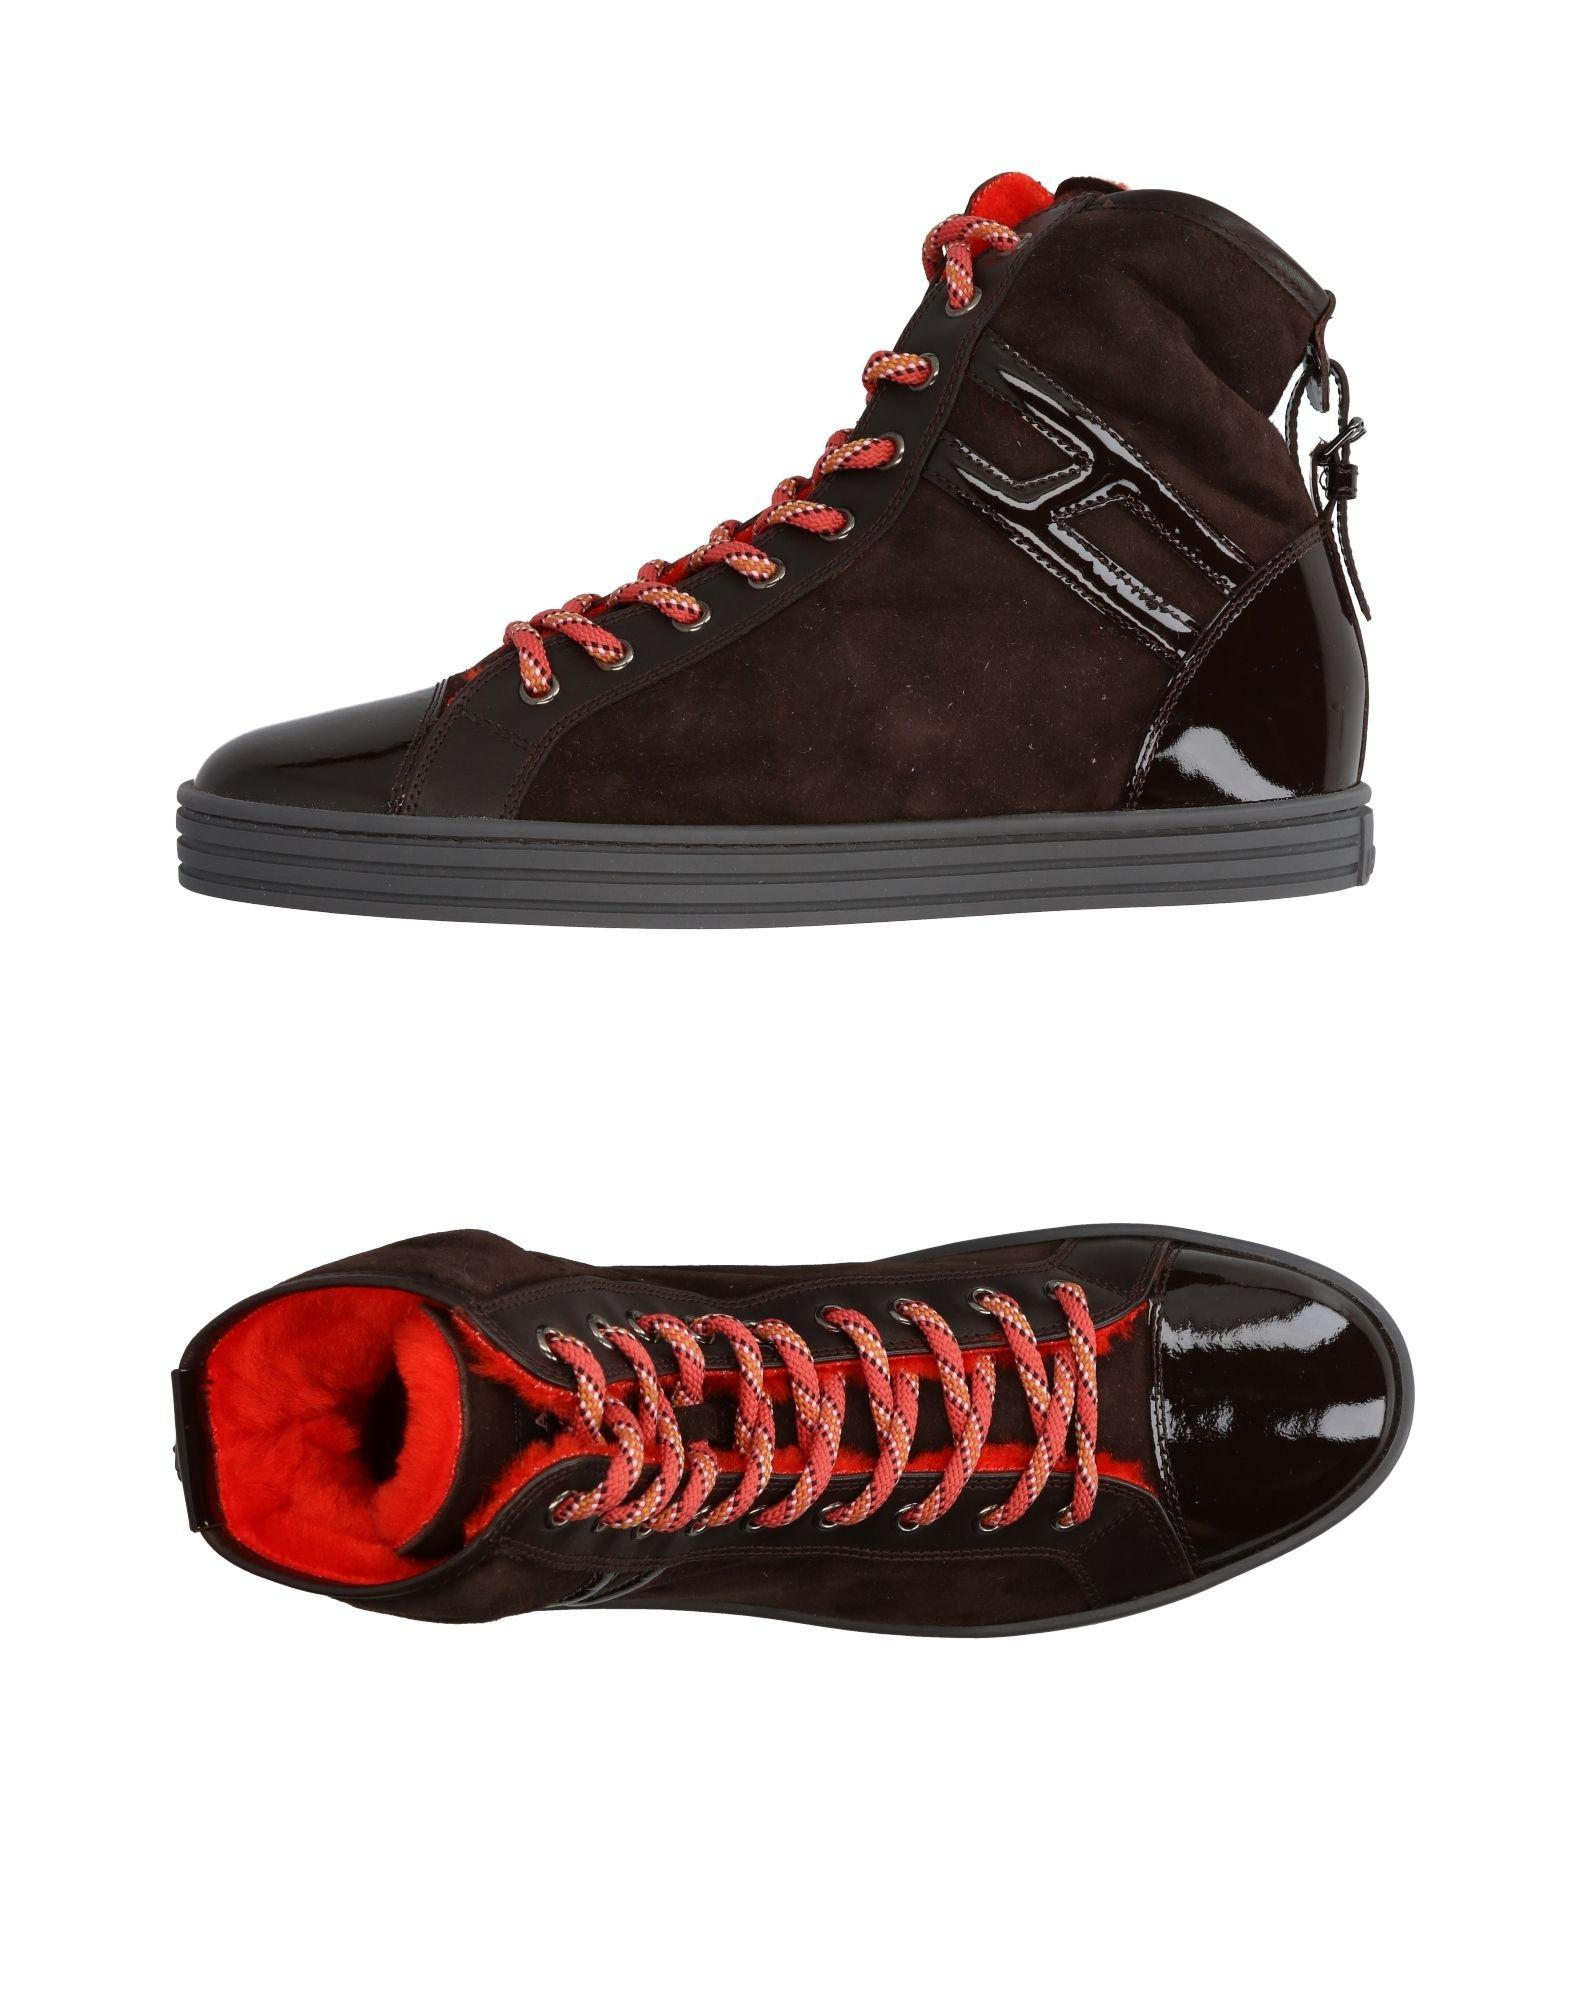 cae43ec5003 Lyst - Hogan Rebel High-tops   Sneakers in Brown for Men